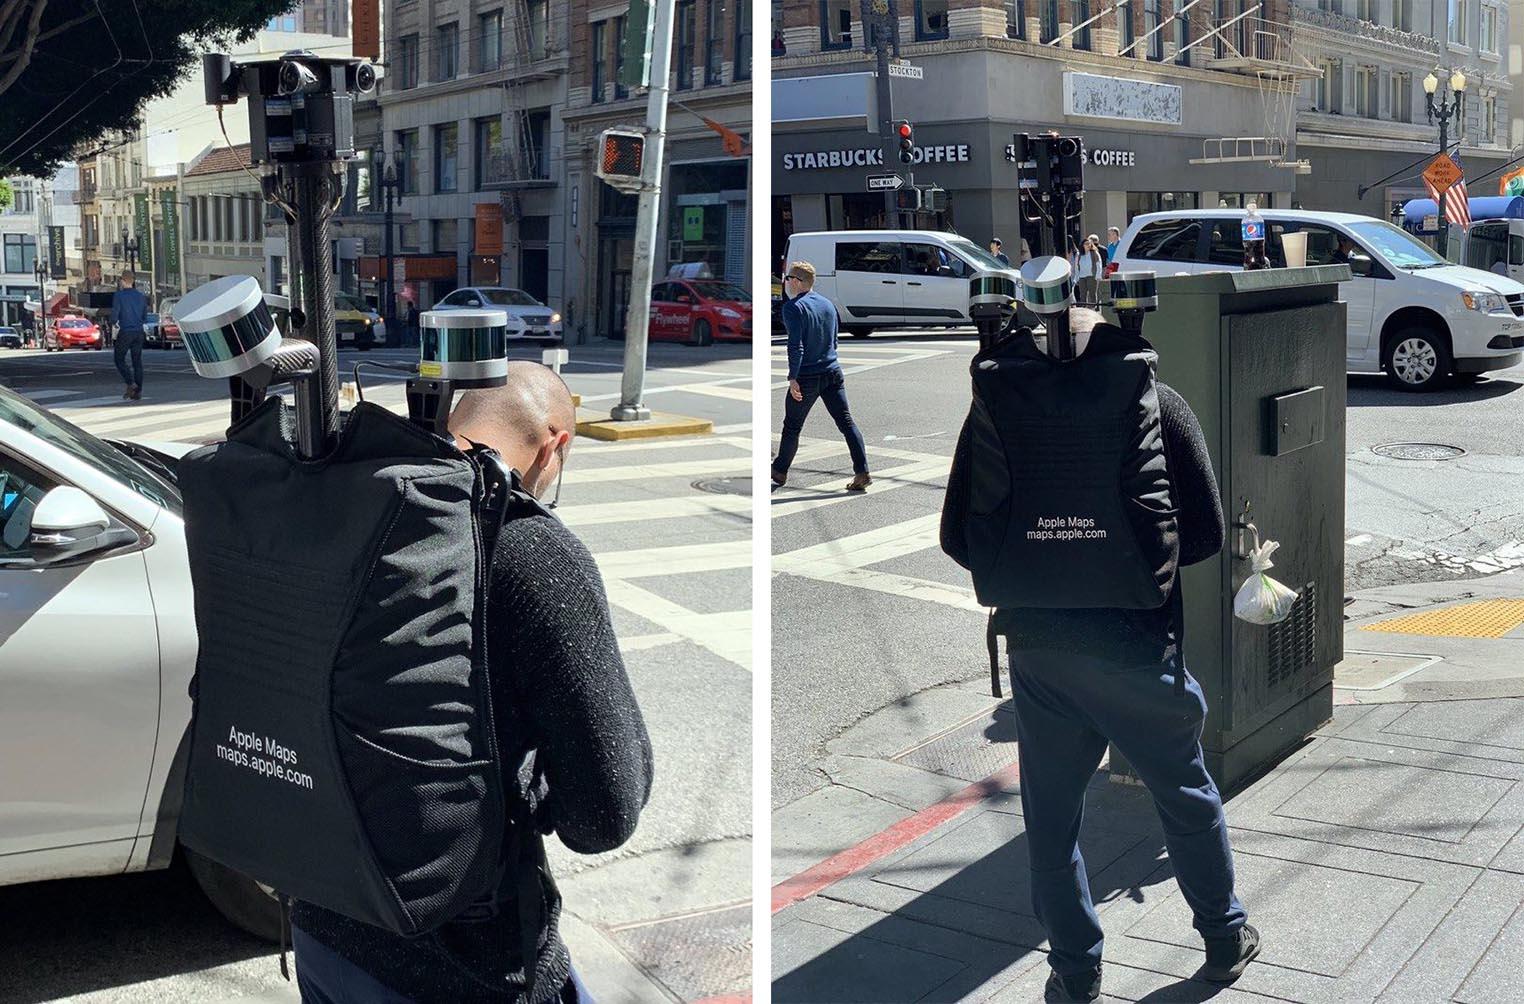 Apple Maps piéton sac à dos